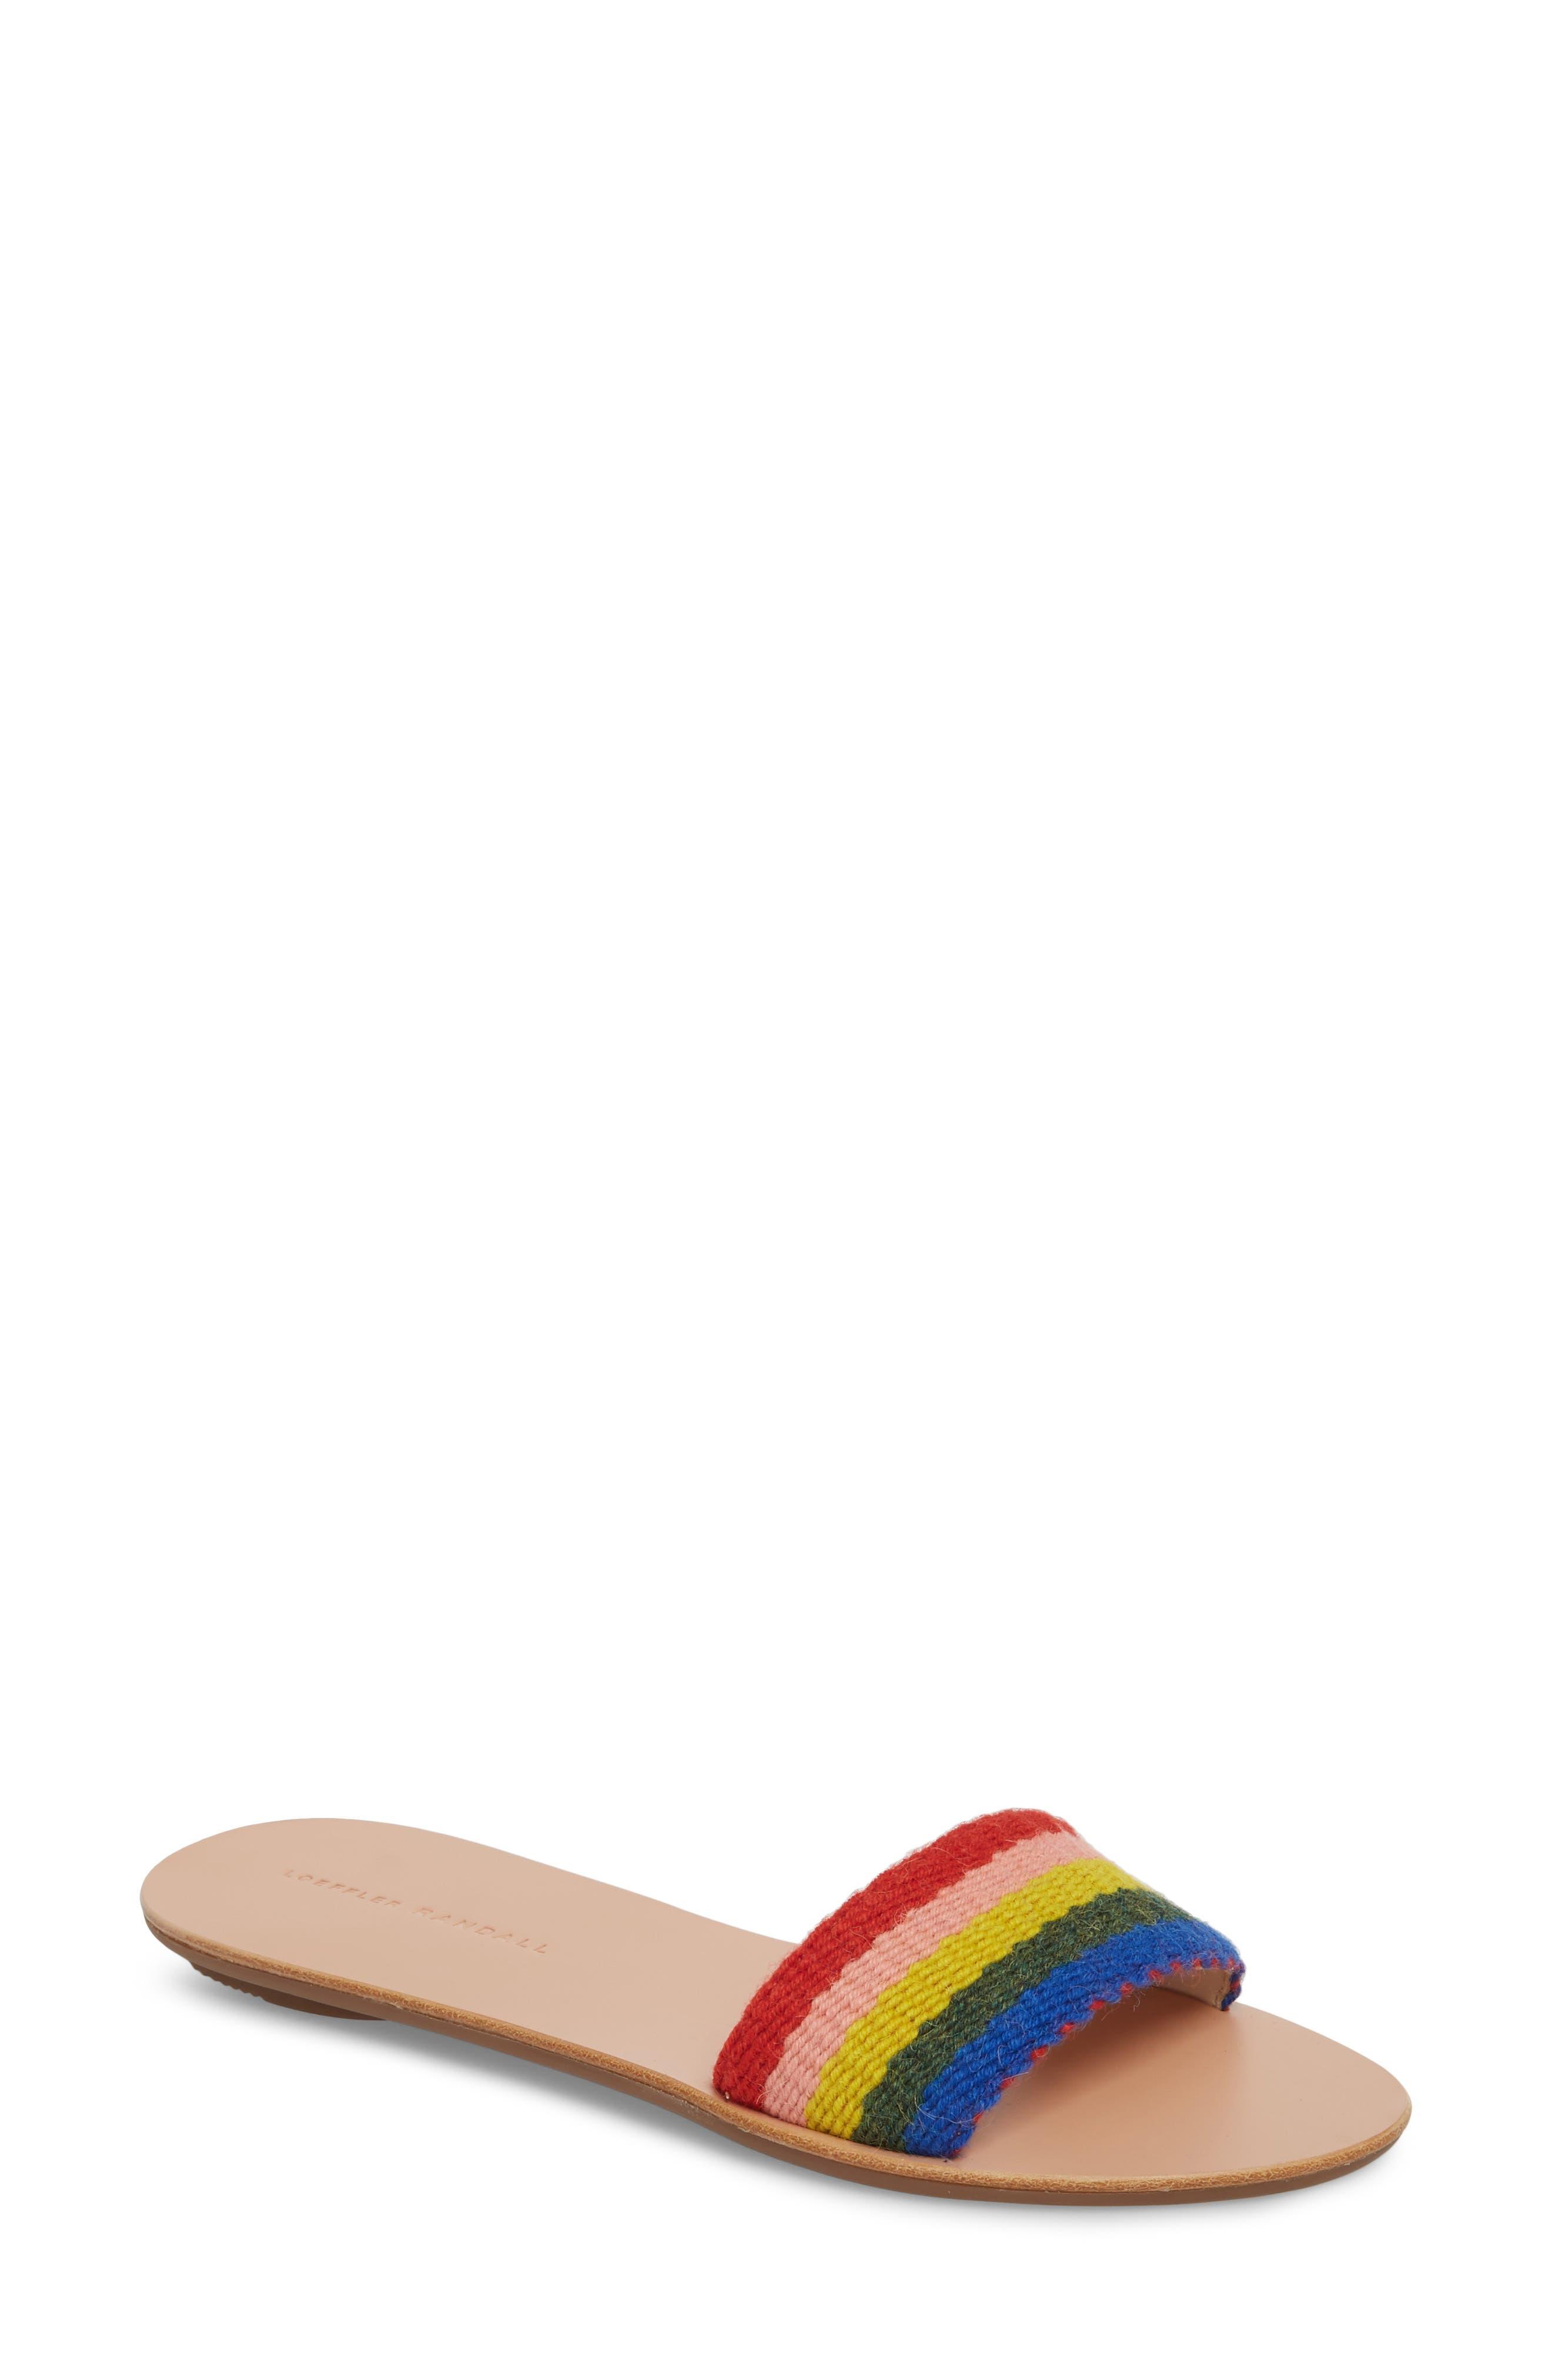 Stella Woven Slide Sandal,                         Main,                         color, Rainbow Fabric